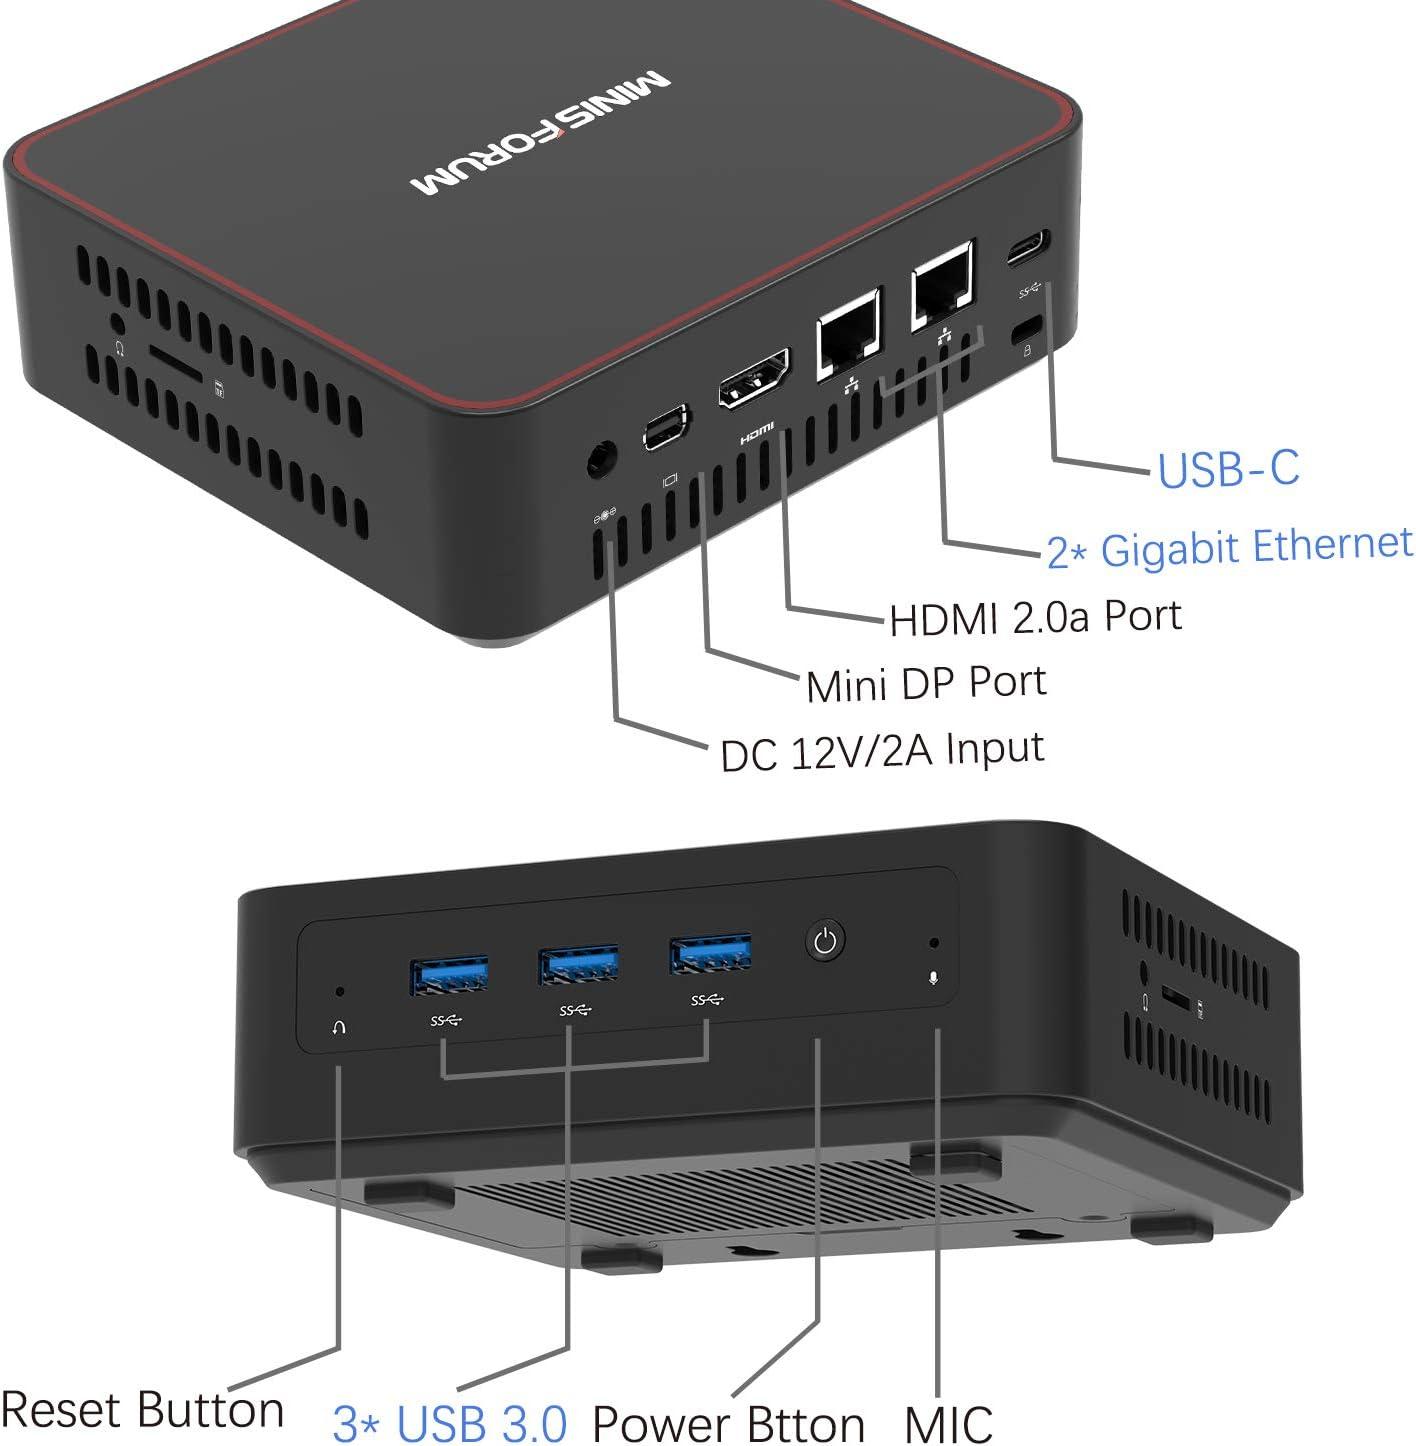 2 x Ethernet Port 3 x USB 3.0 Expandable 8GB DDR3L 1600 SODIMM 128GB SSD HDMI//Mini DP//USB-C 4K@60Hz Output Linux and Chromium OS U500-H Mini PC Intel Core i3-5005U Mini Computer Windows 10 Pro